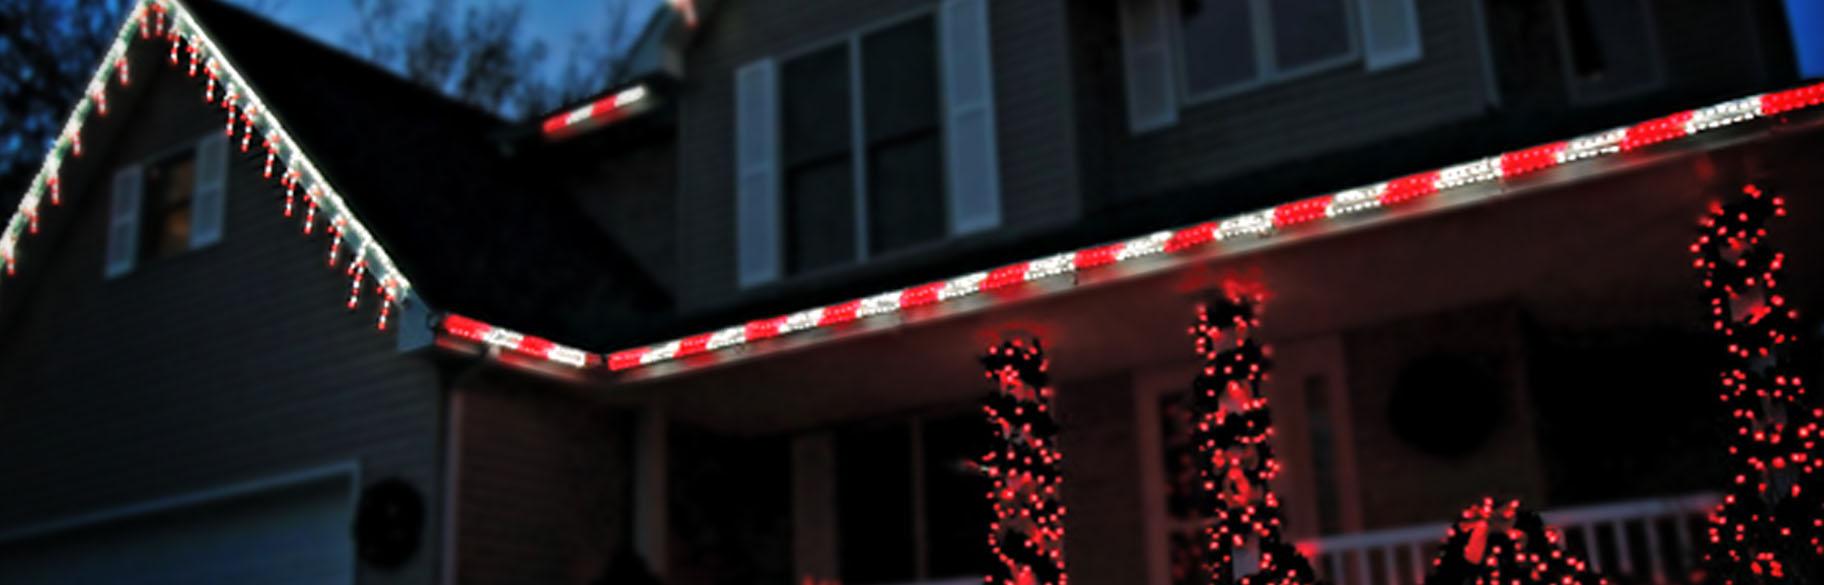 Holiday Lighting 2